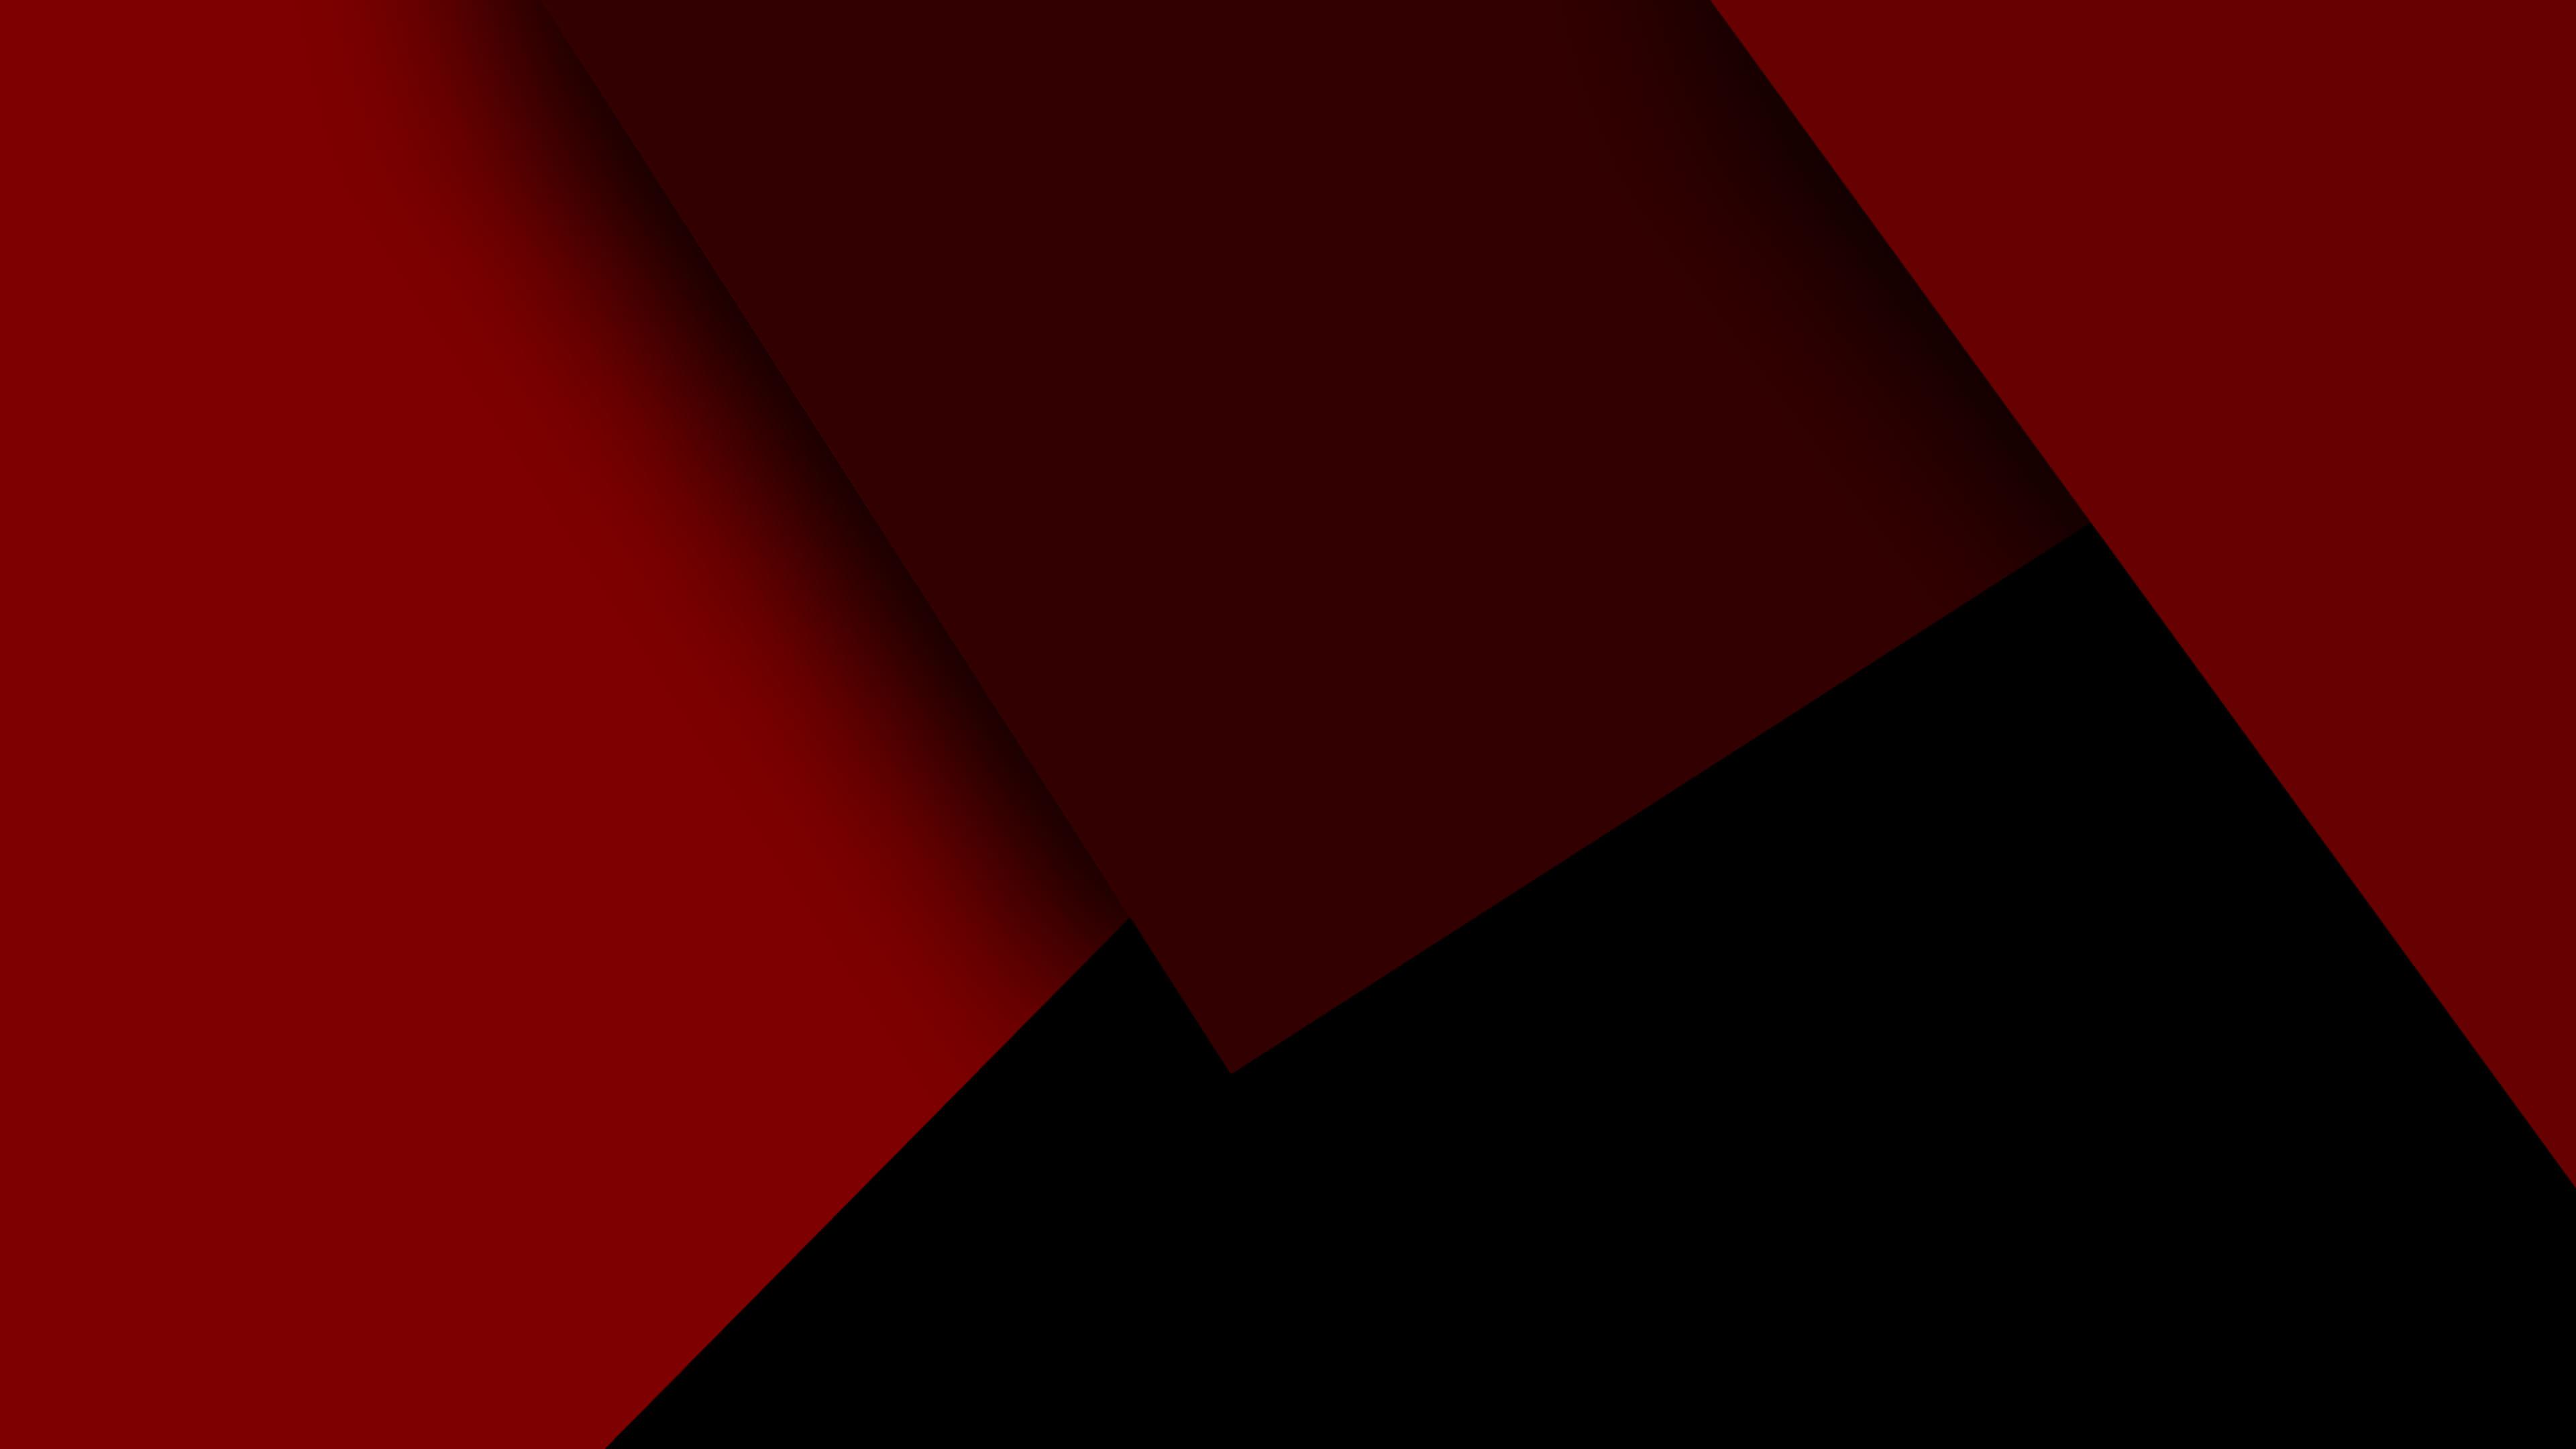 Isometric Strips HD wallpaper for 4K 3840 x 2160   HDwallpapersnet 3840x2160